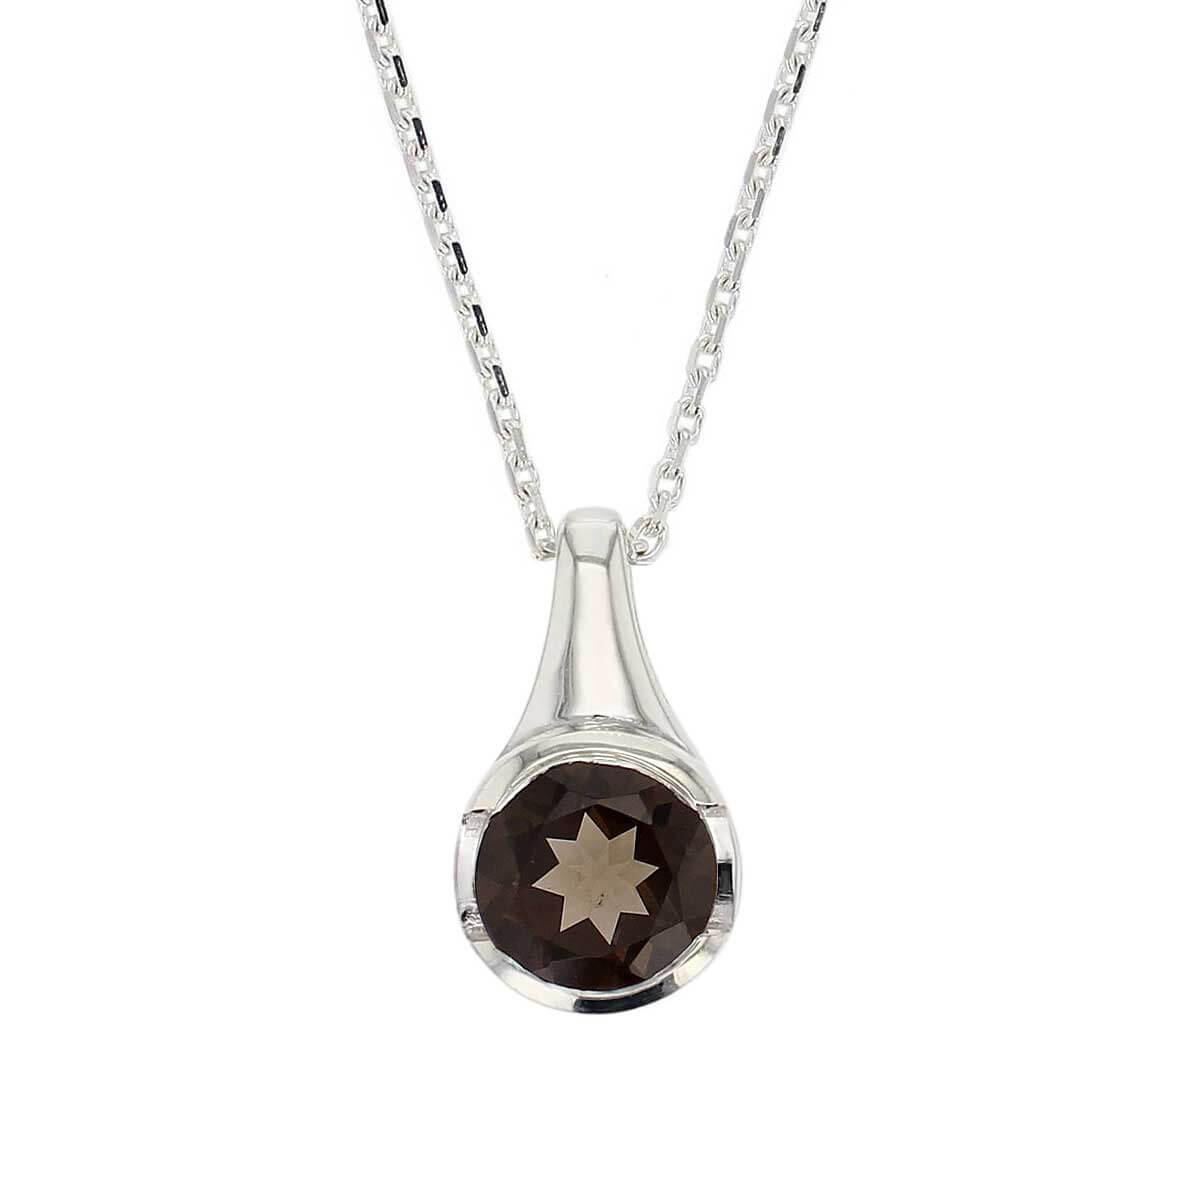 sterling silver round cut faceted smoky quartz gemstone pendant, designer jewellery, brown quartz gem, jewelry, handmade by Faller, Londonderry, Northern Ireland, Irish hand crafted, darcy, D'arcy, smokey